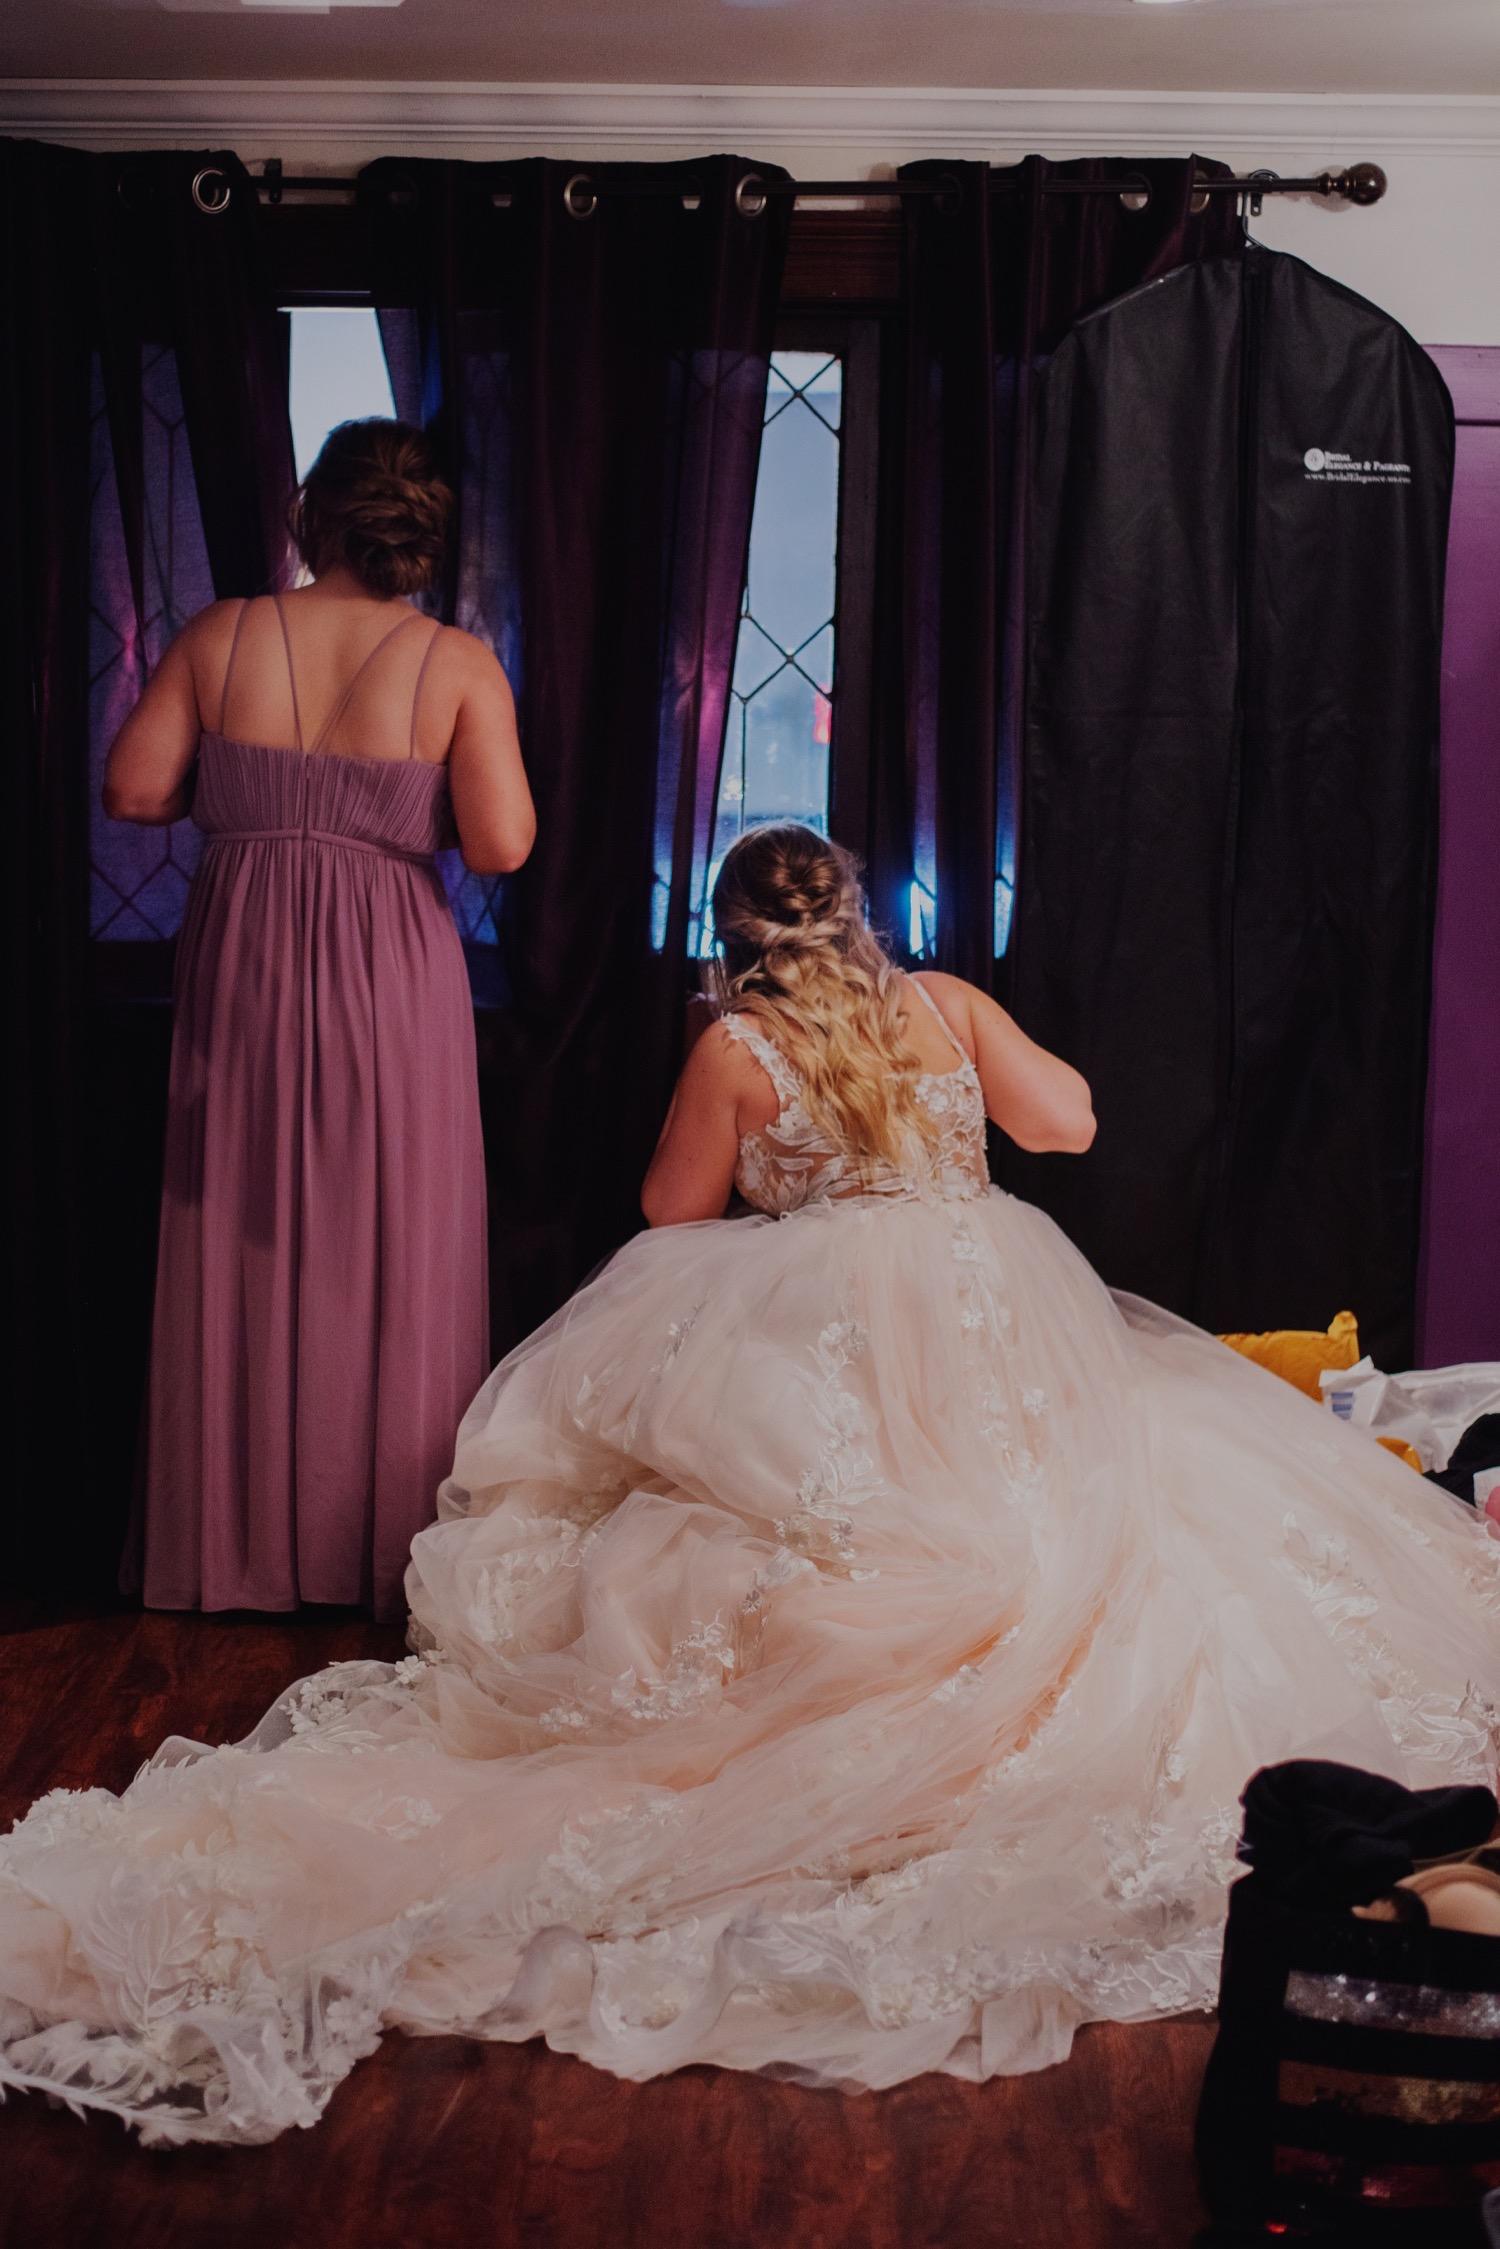 088_Benckendor-TheSilverFox-Streator-Wedding_0130.jpg